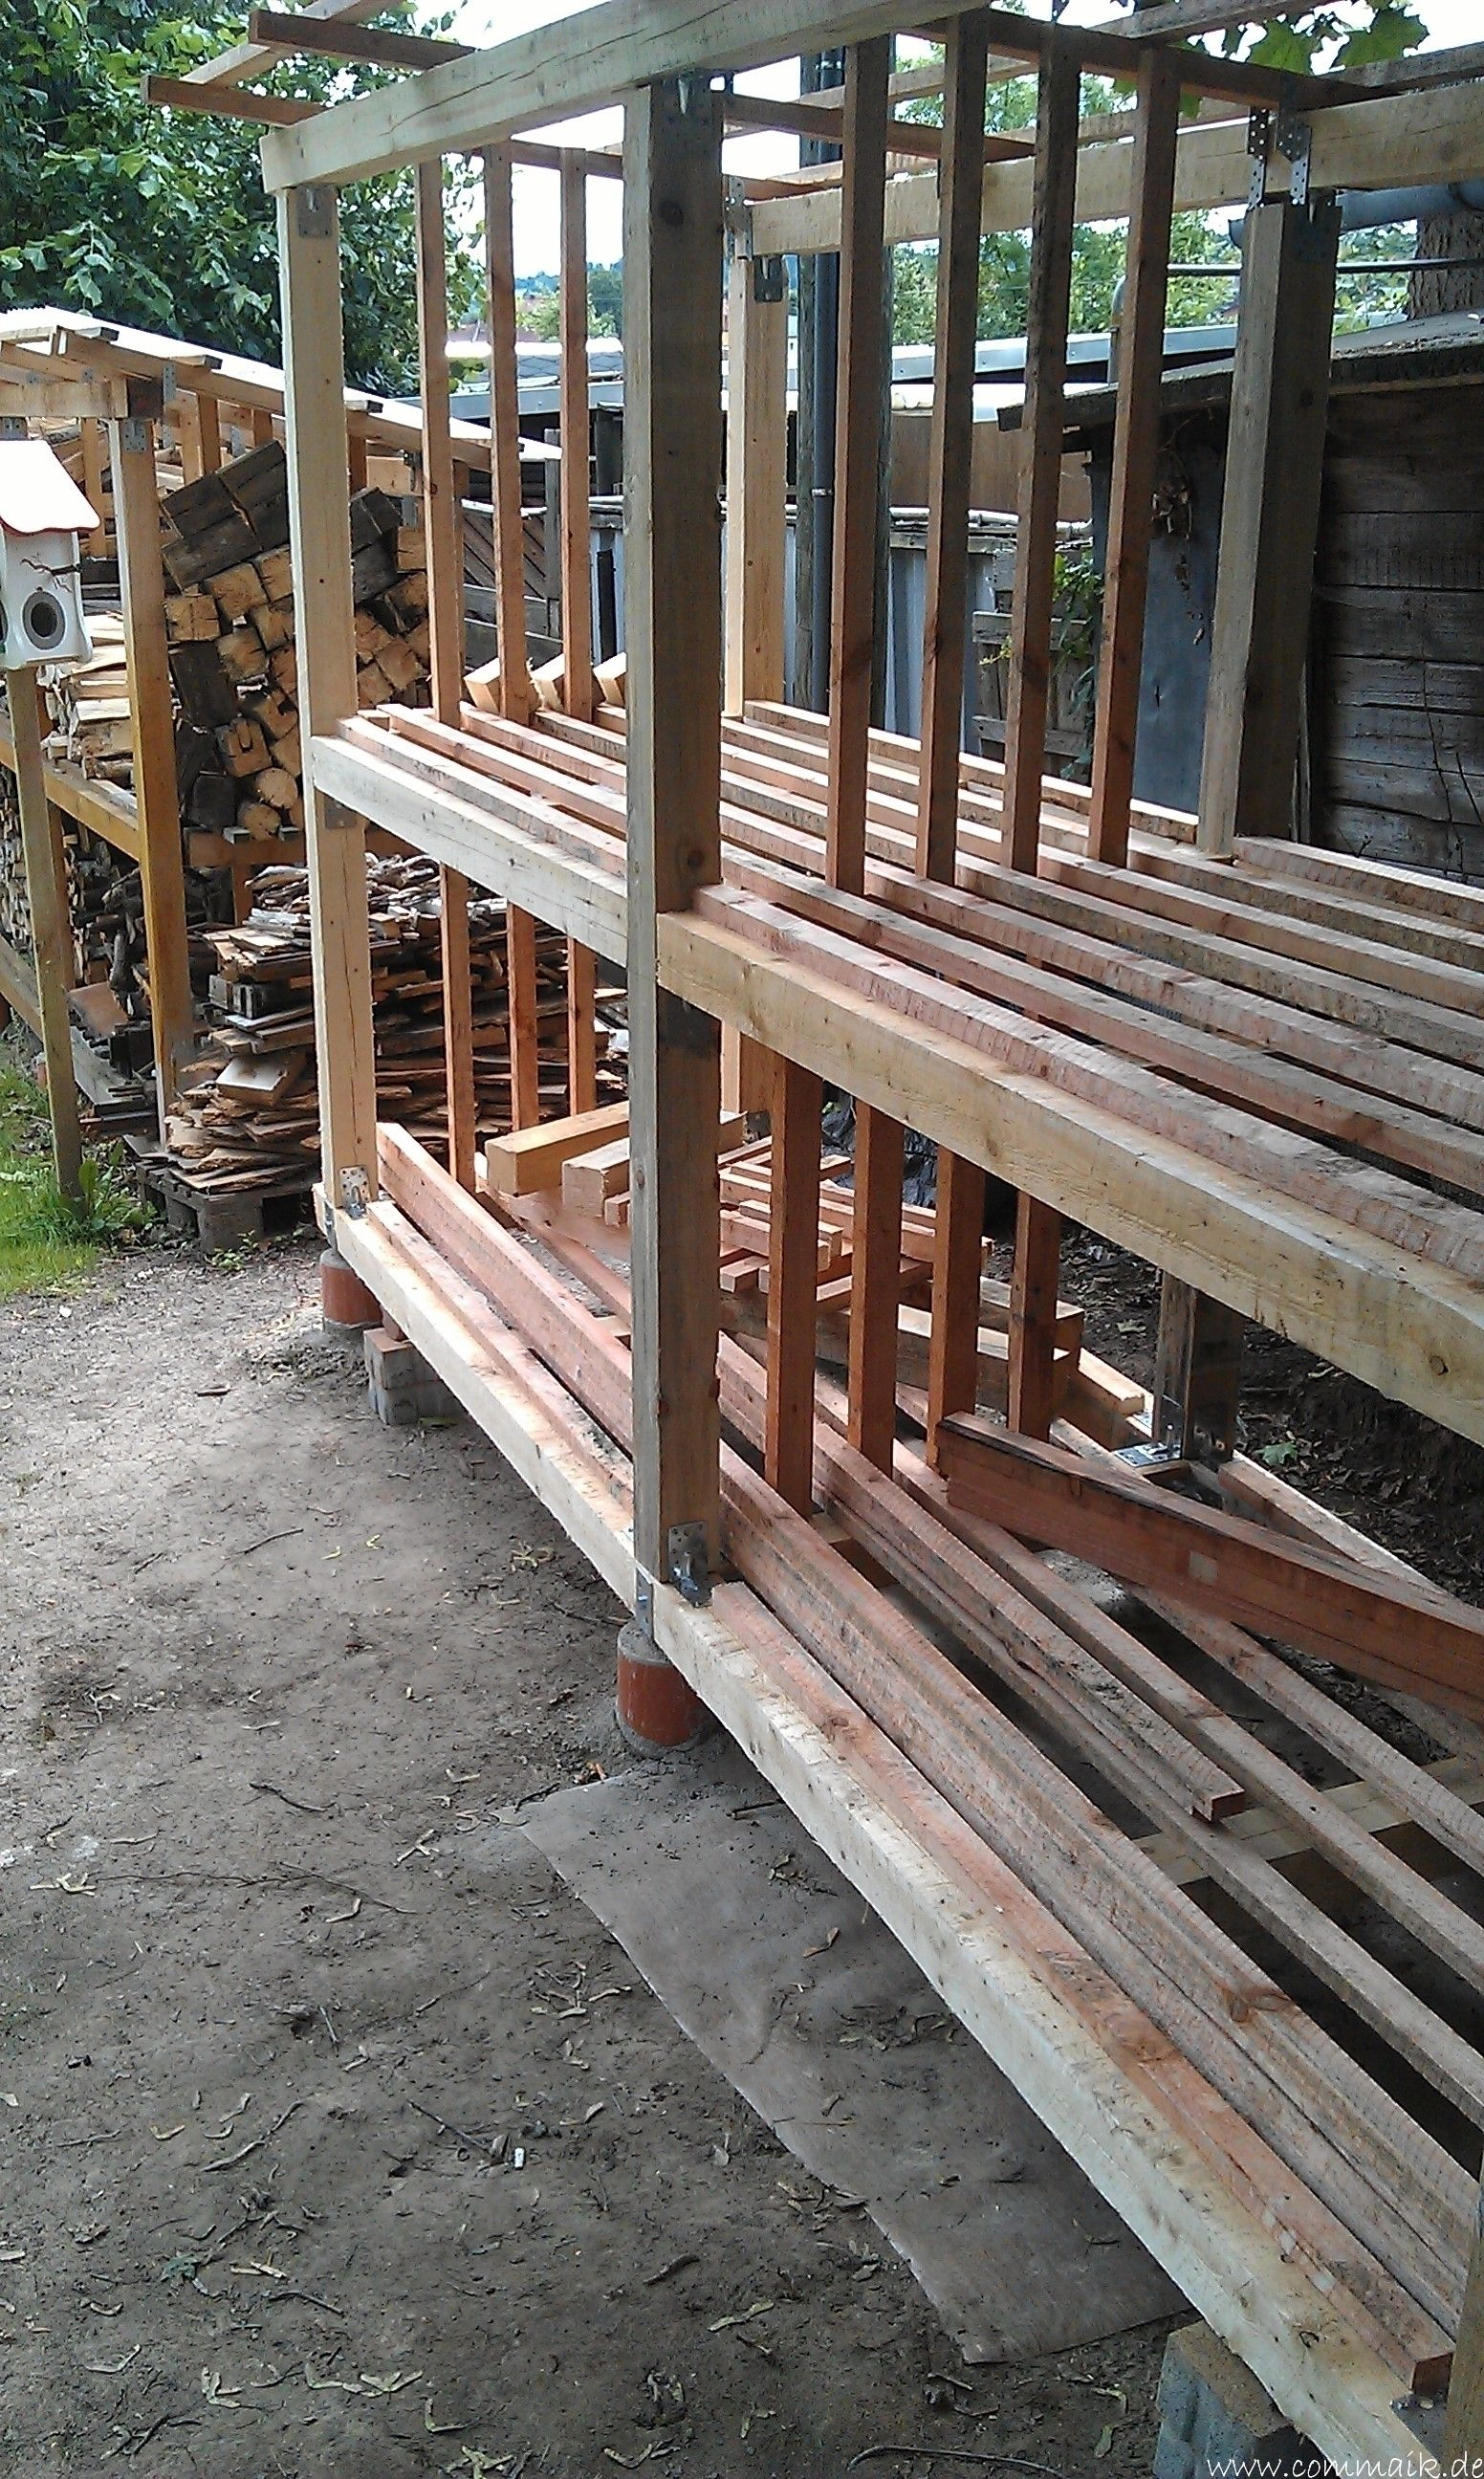 Das zweite Brennholzregal entsteht Brennholzregal, Holz